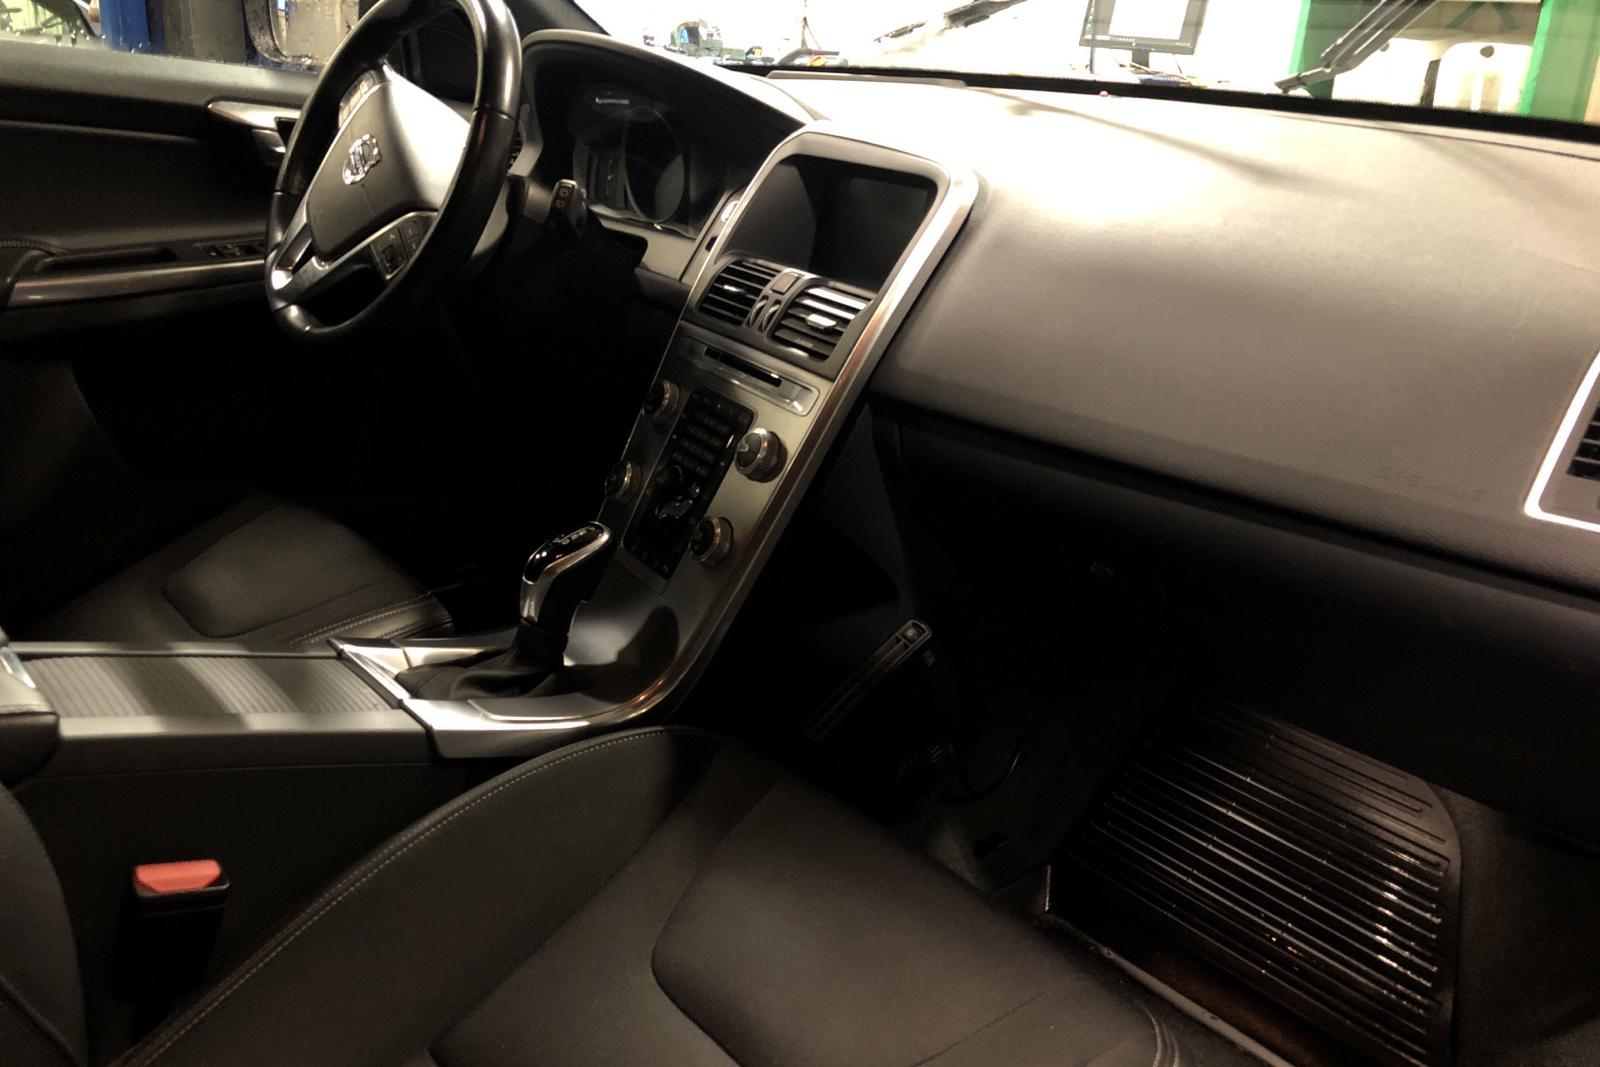 Volvo XC60 D4 AWD (190hk) - 101 040 km - Automatic - black - 2017